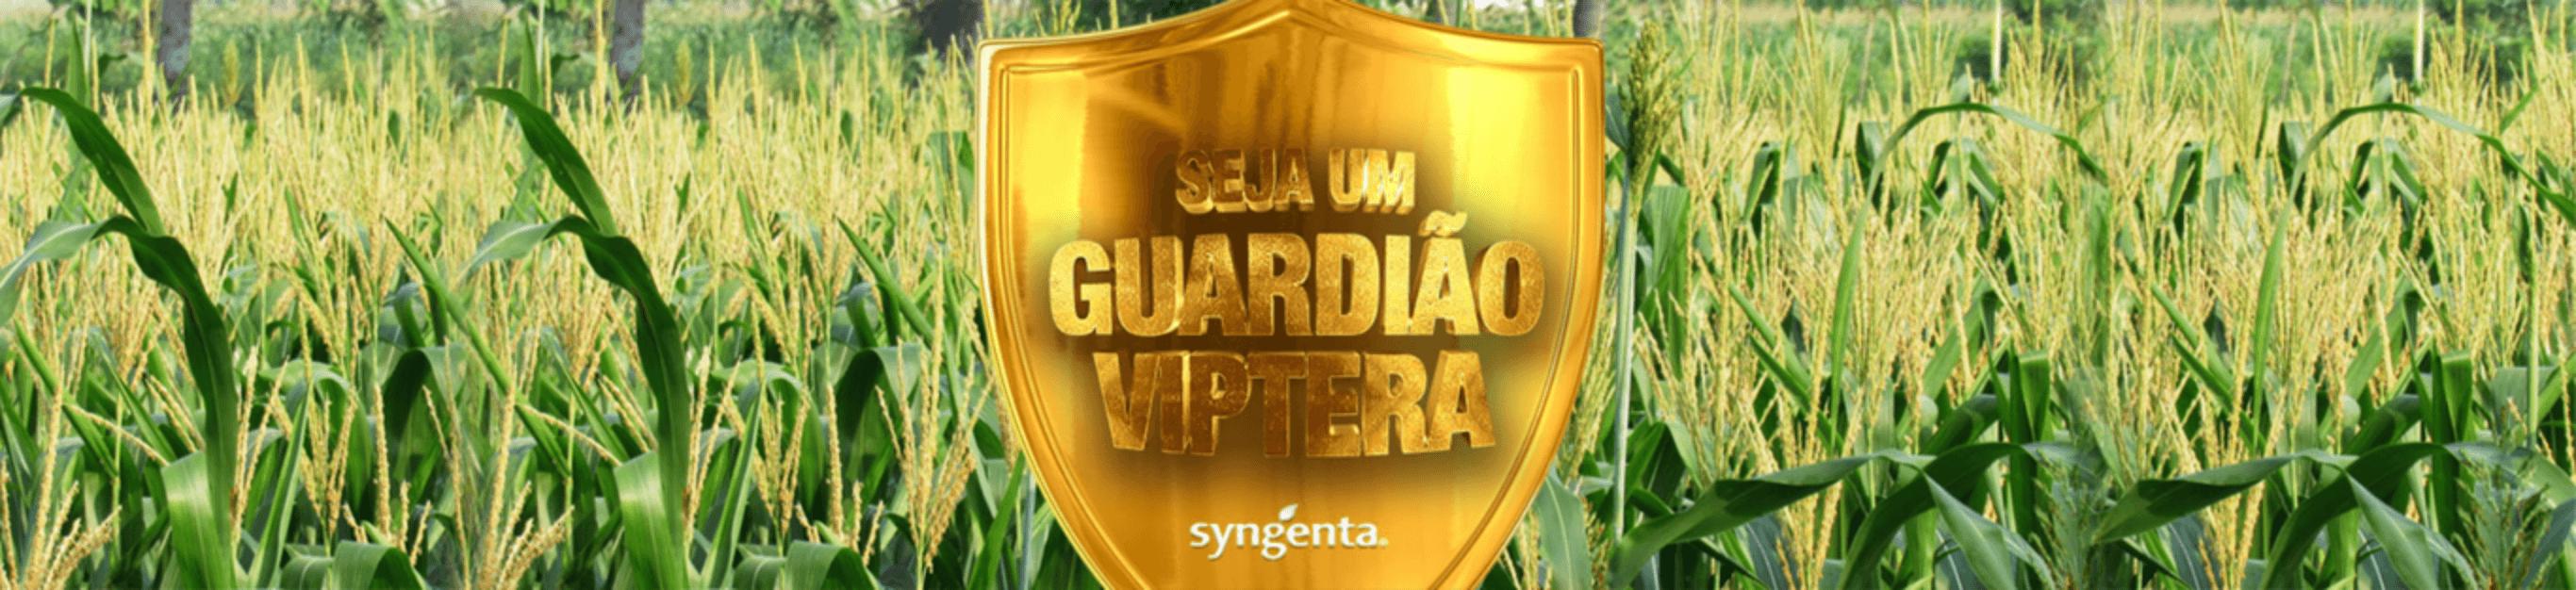 Banner Guardião Viptera